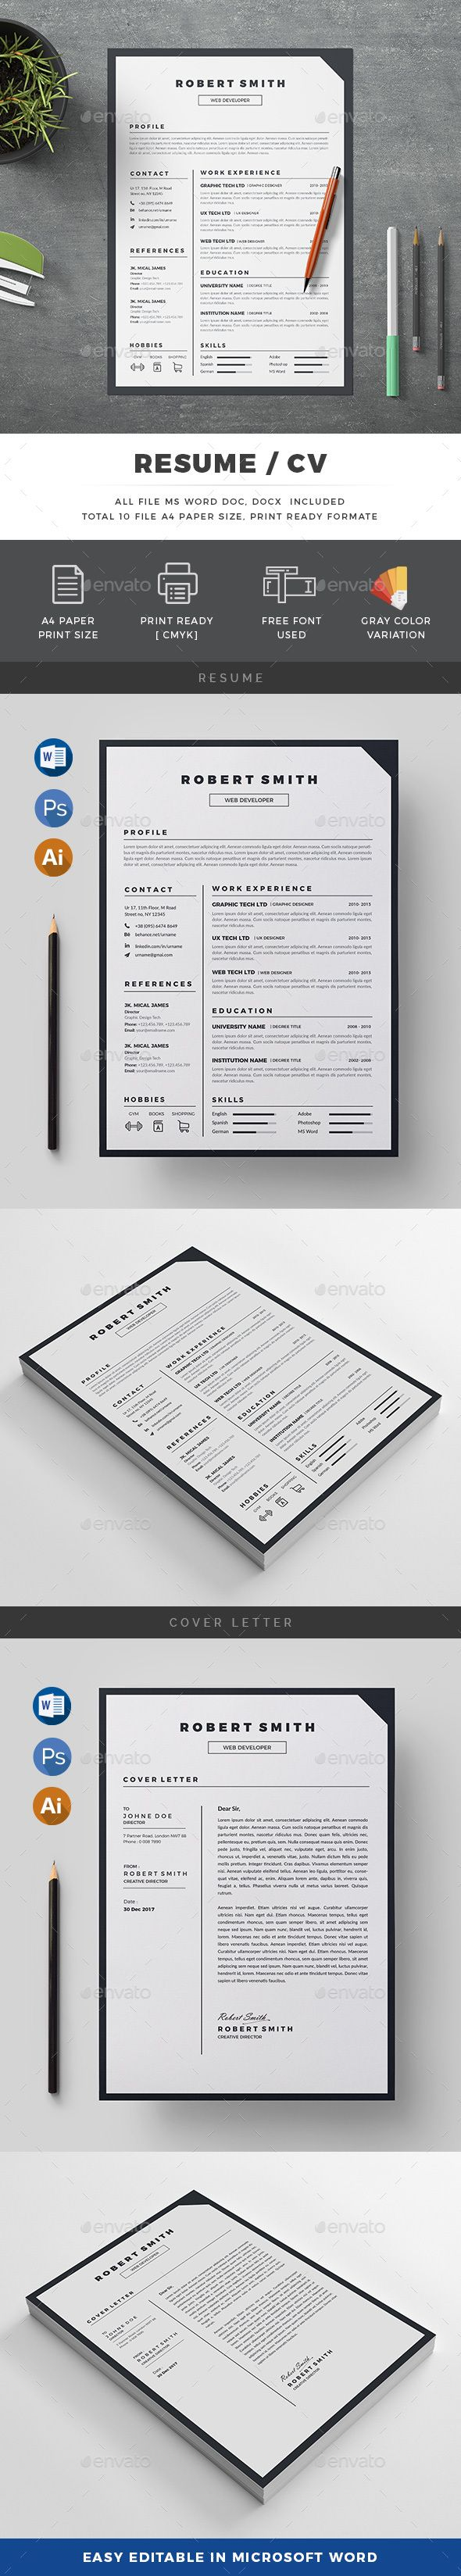 printable resume format%0A  simple  clean  minimal  modern  professional  Resume  template  design